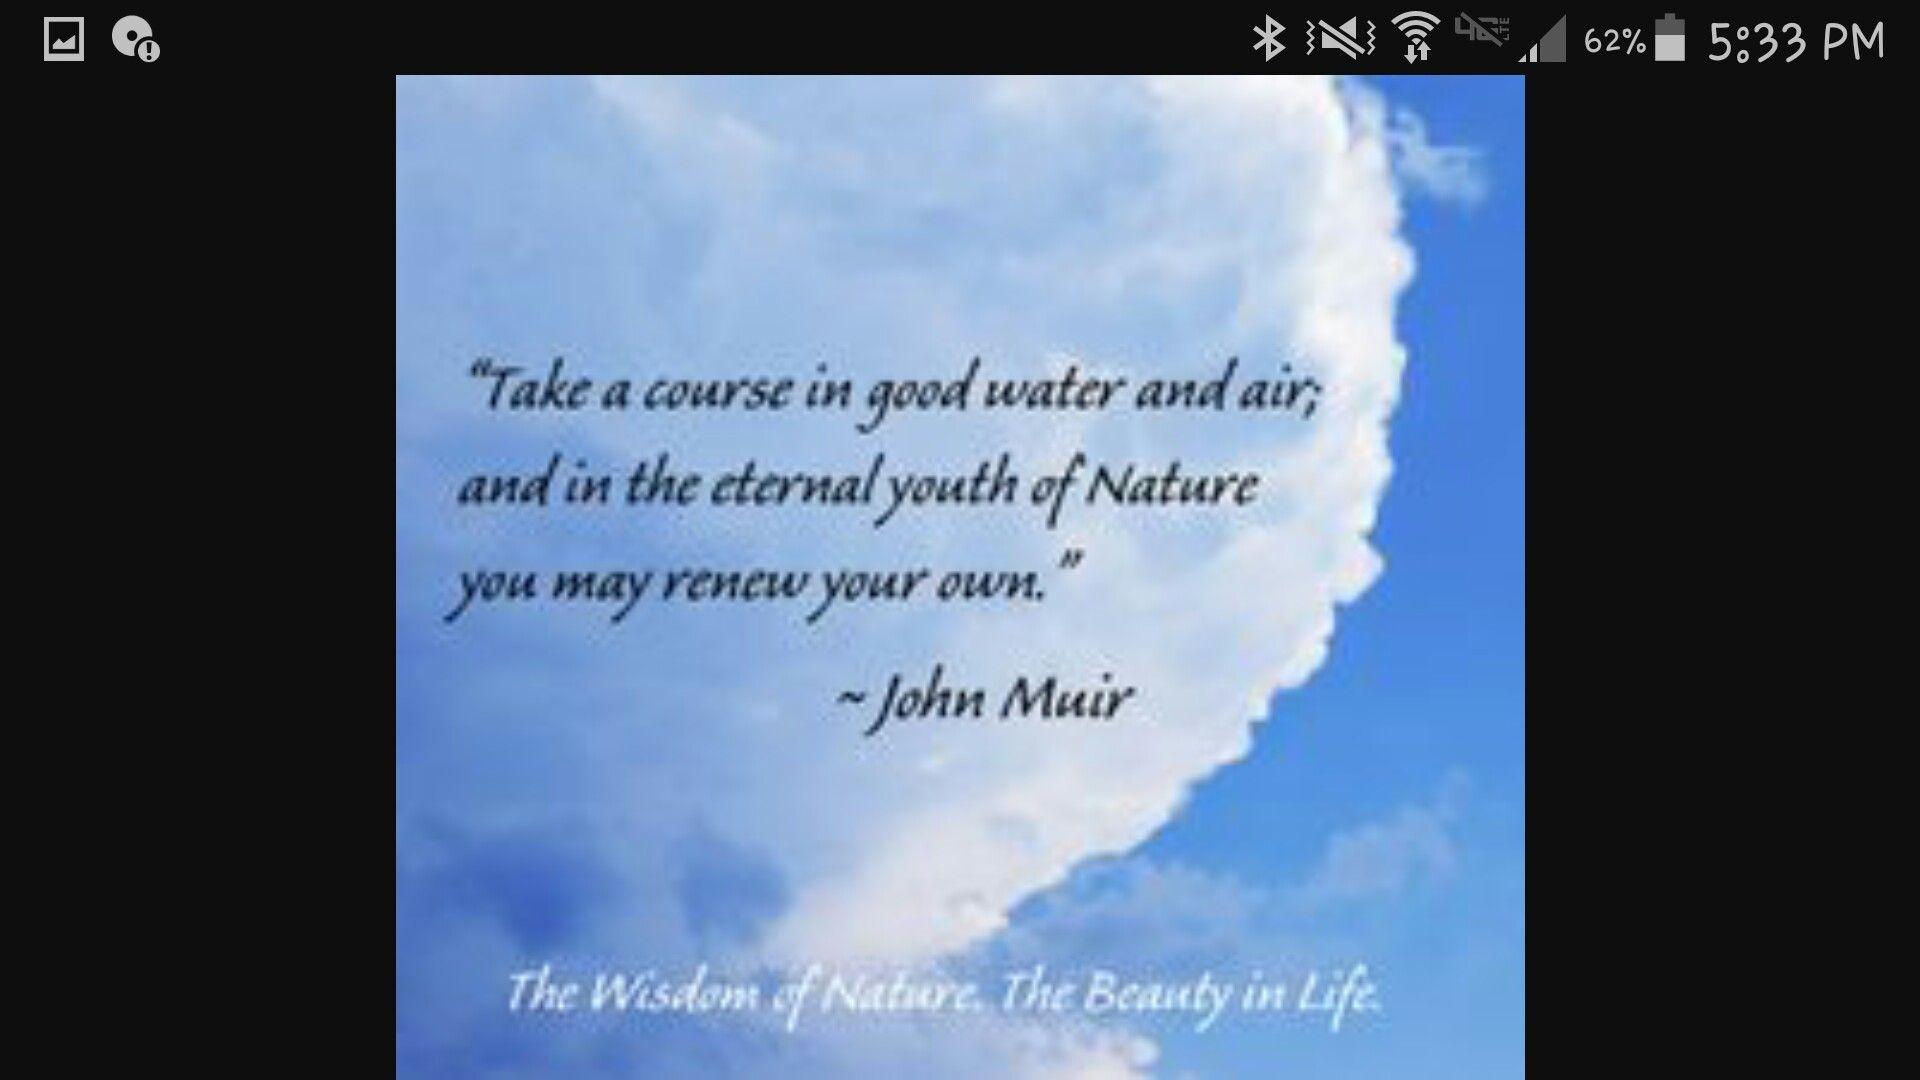 Pin By Sam Pendley On My Inspirational Board John Muir Nature